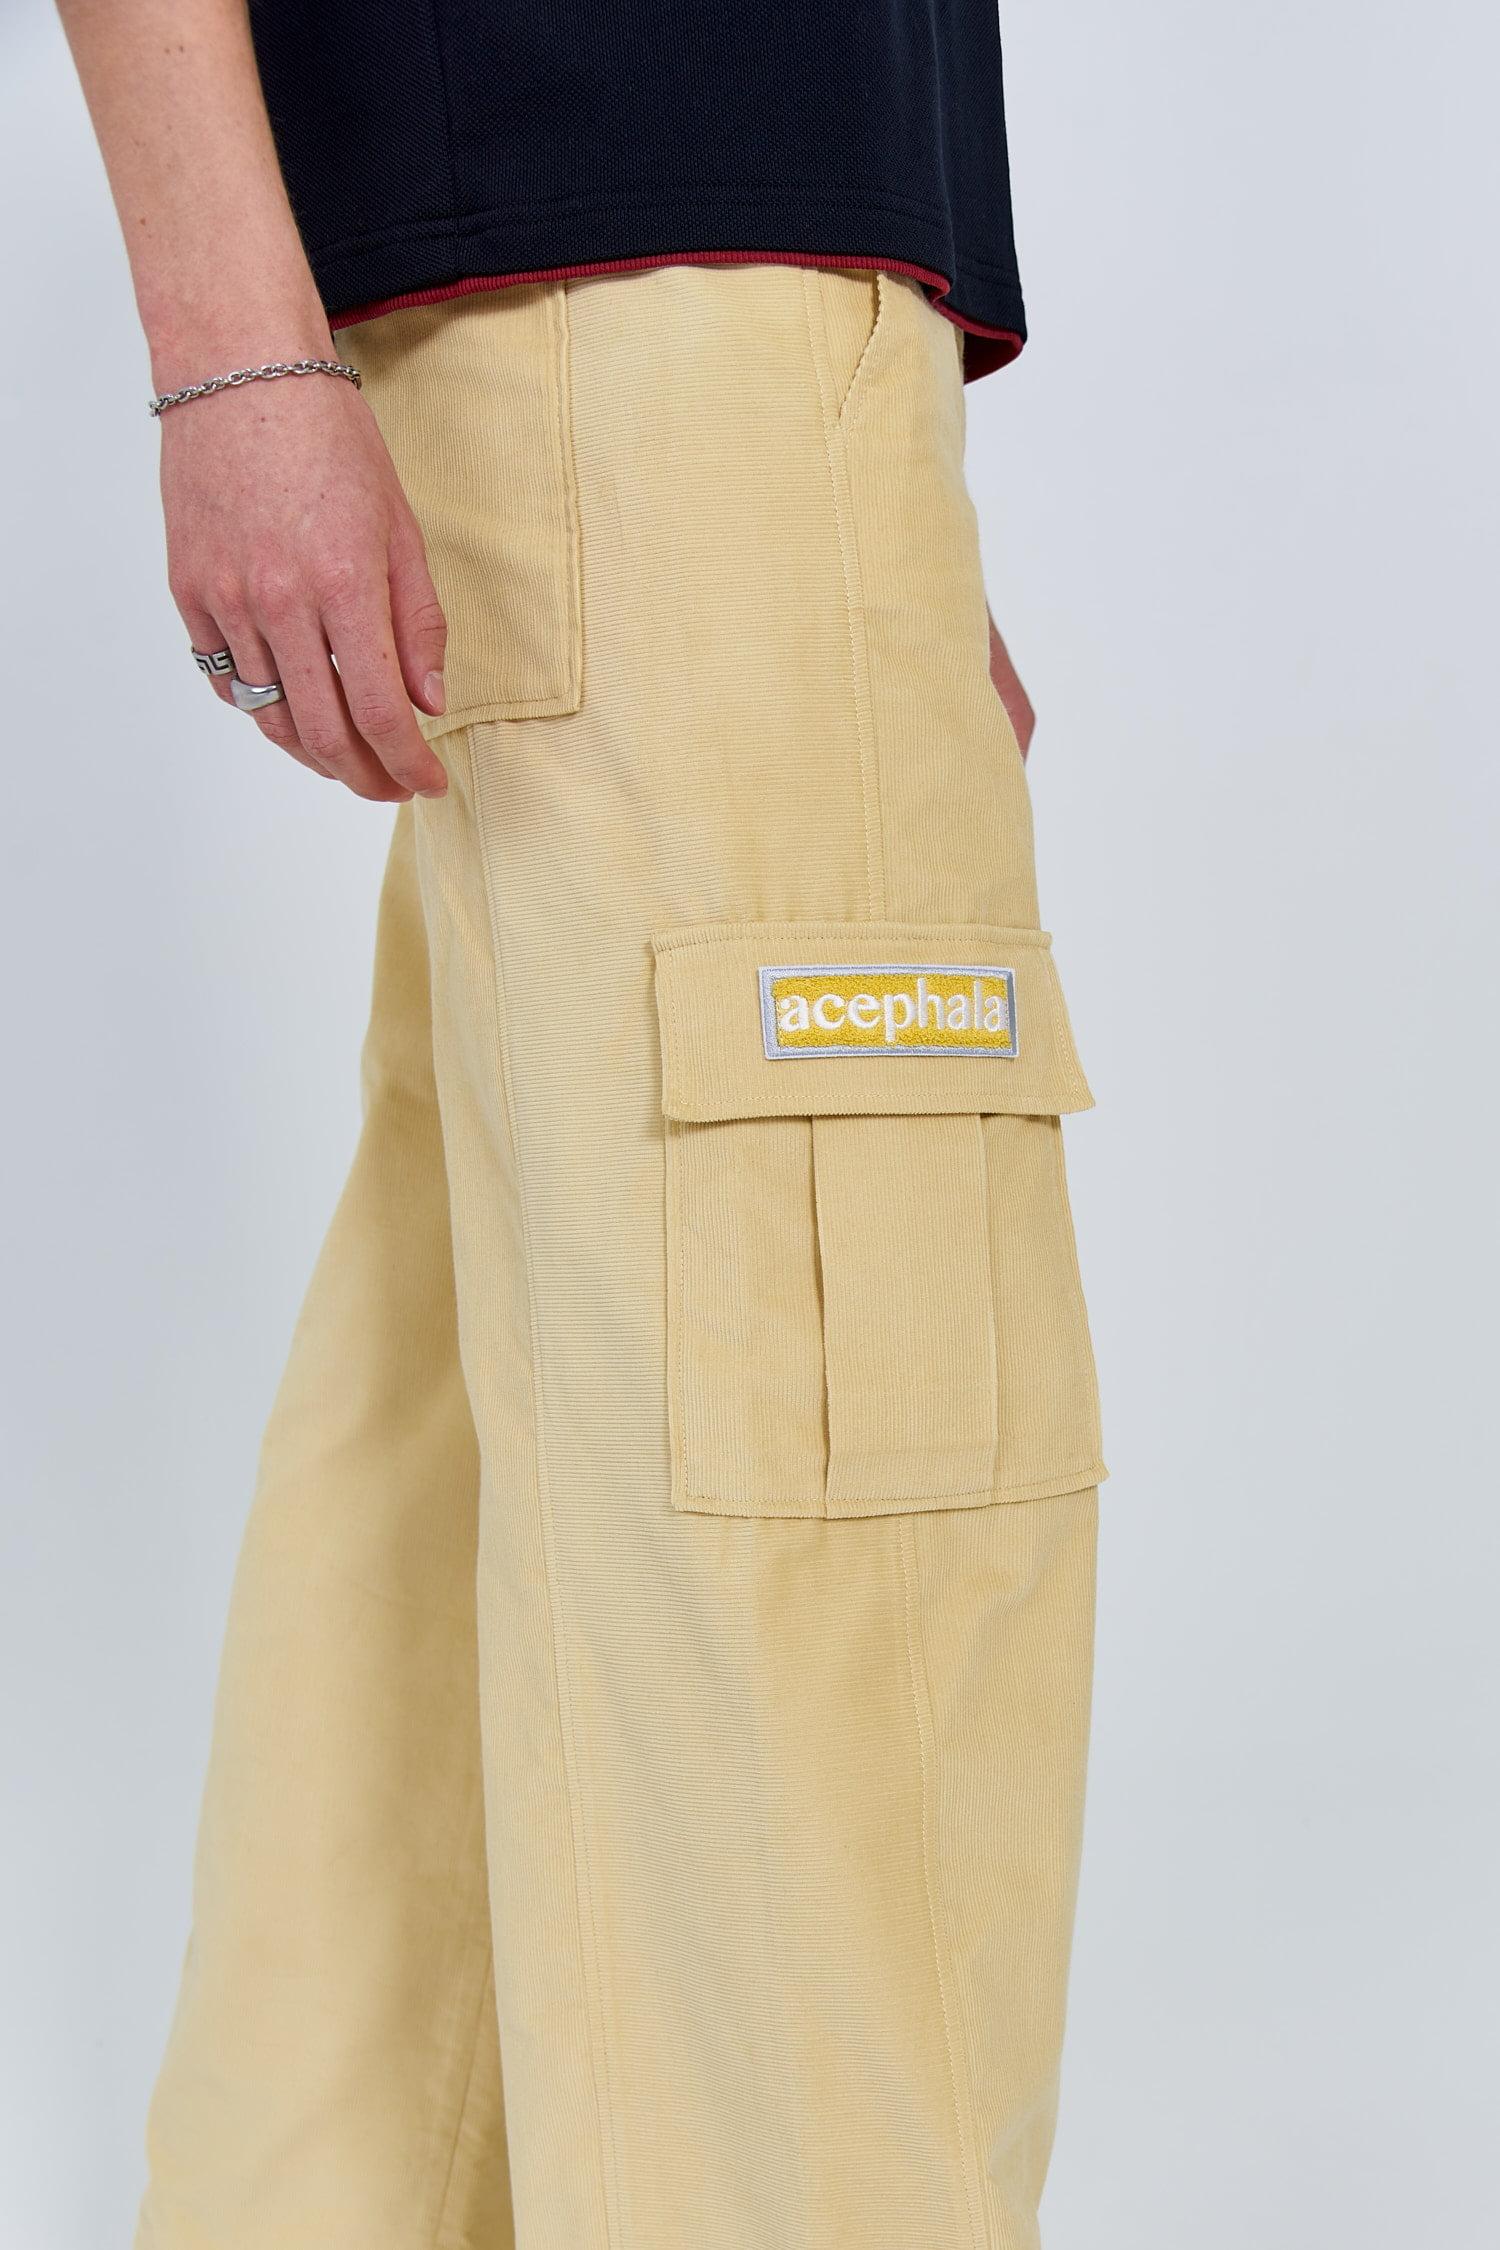 Acephala Fw 2020 21 Black Unisex T Shirt Yellow Corduroy Trousers Patch Detail